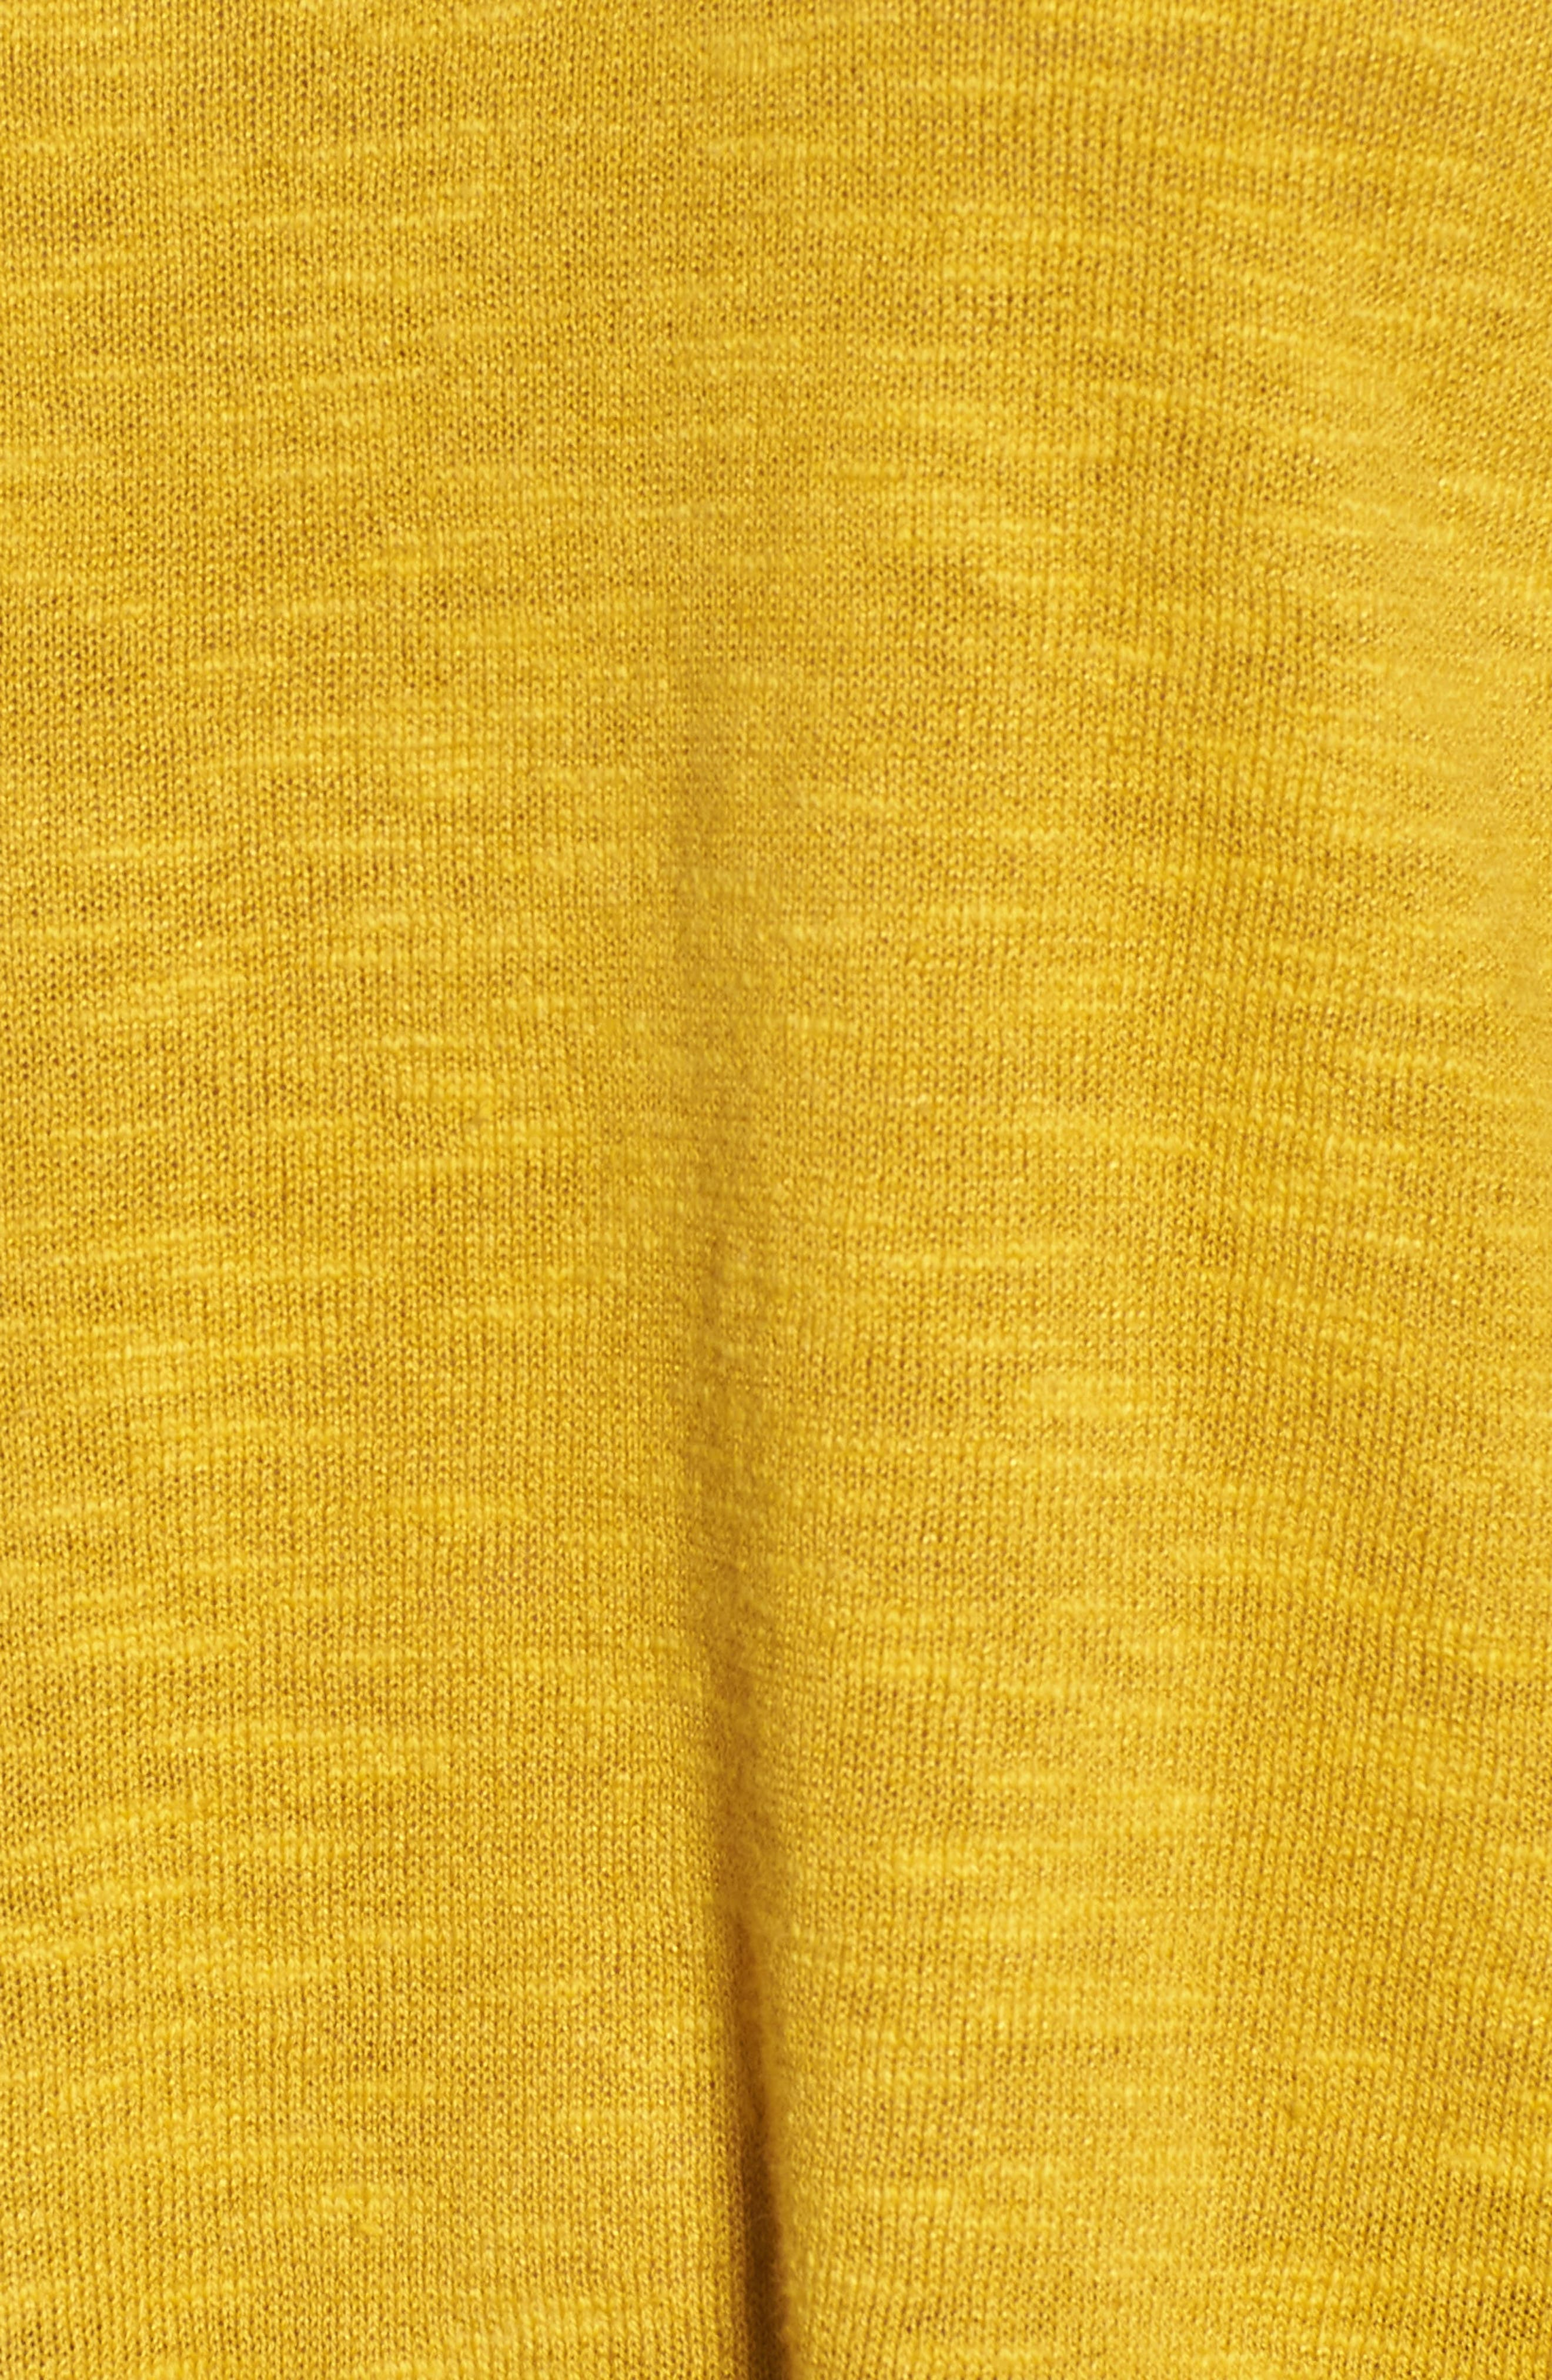 Organic Knit Crewneck Tunic Top,                             Alternate thumbnail 5, color,                             Mustard Seed